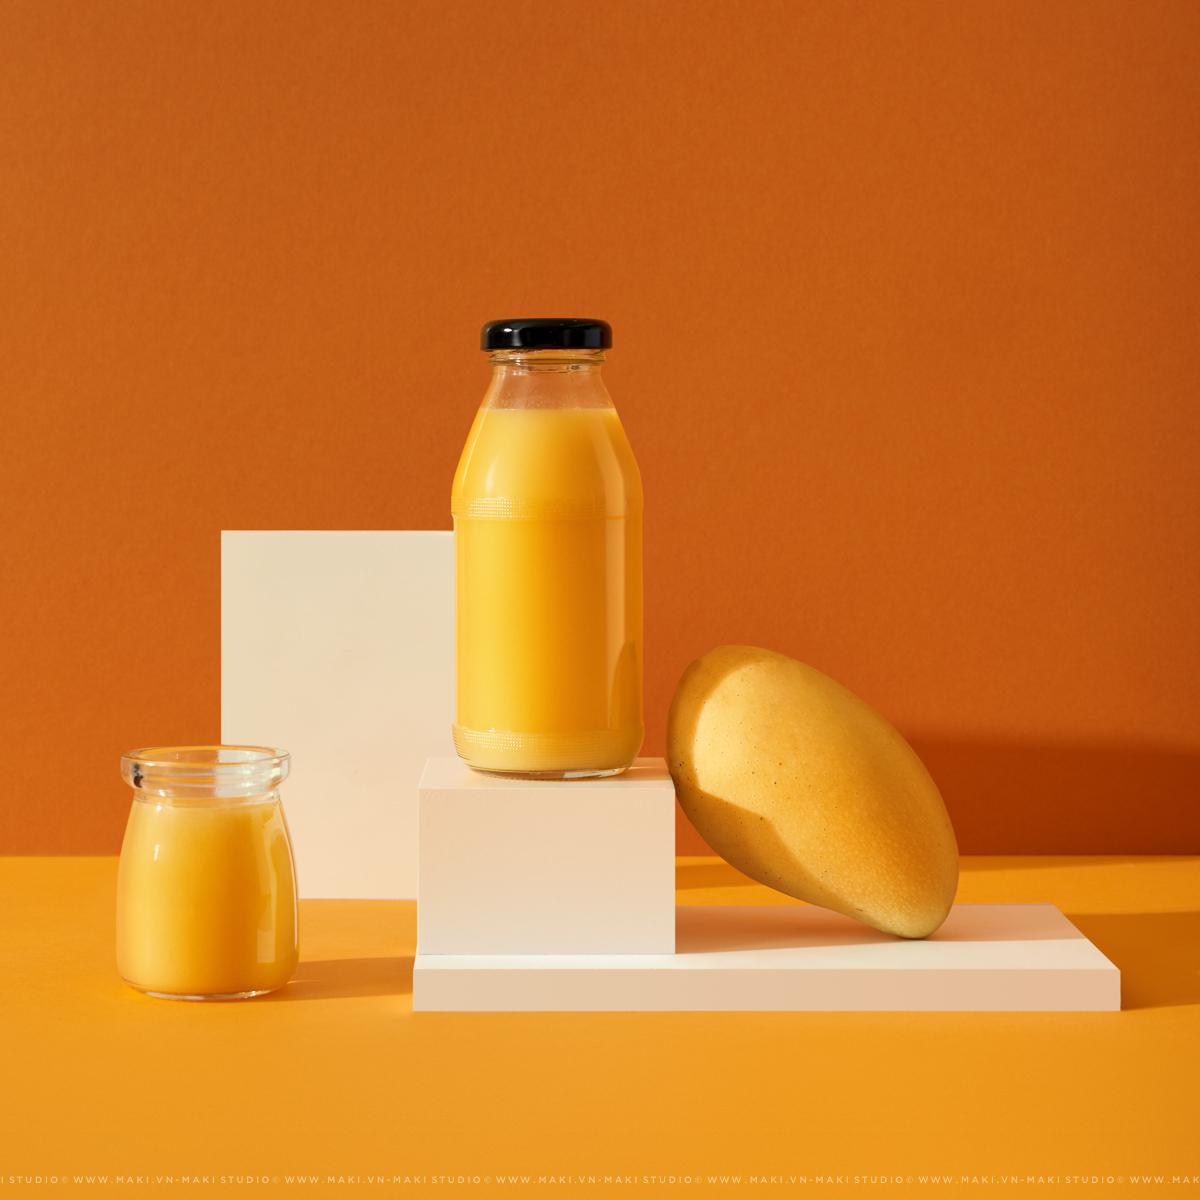 chup-anh-mon-an-summer-fruit-3.jpg